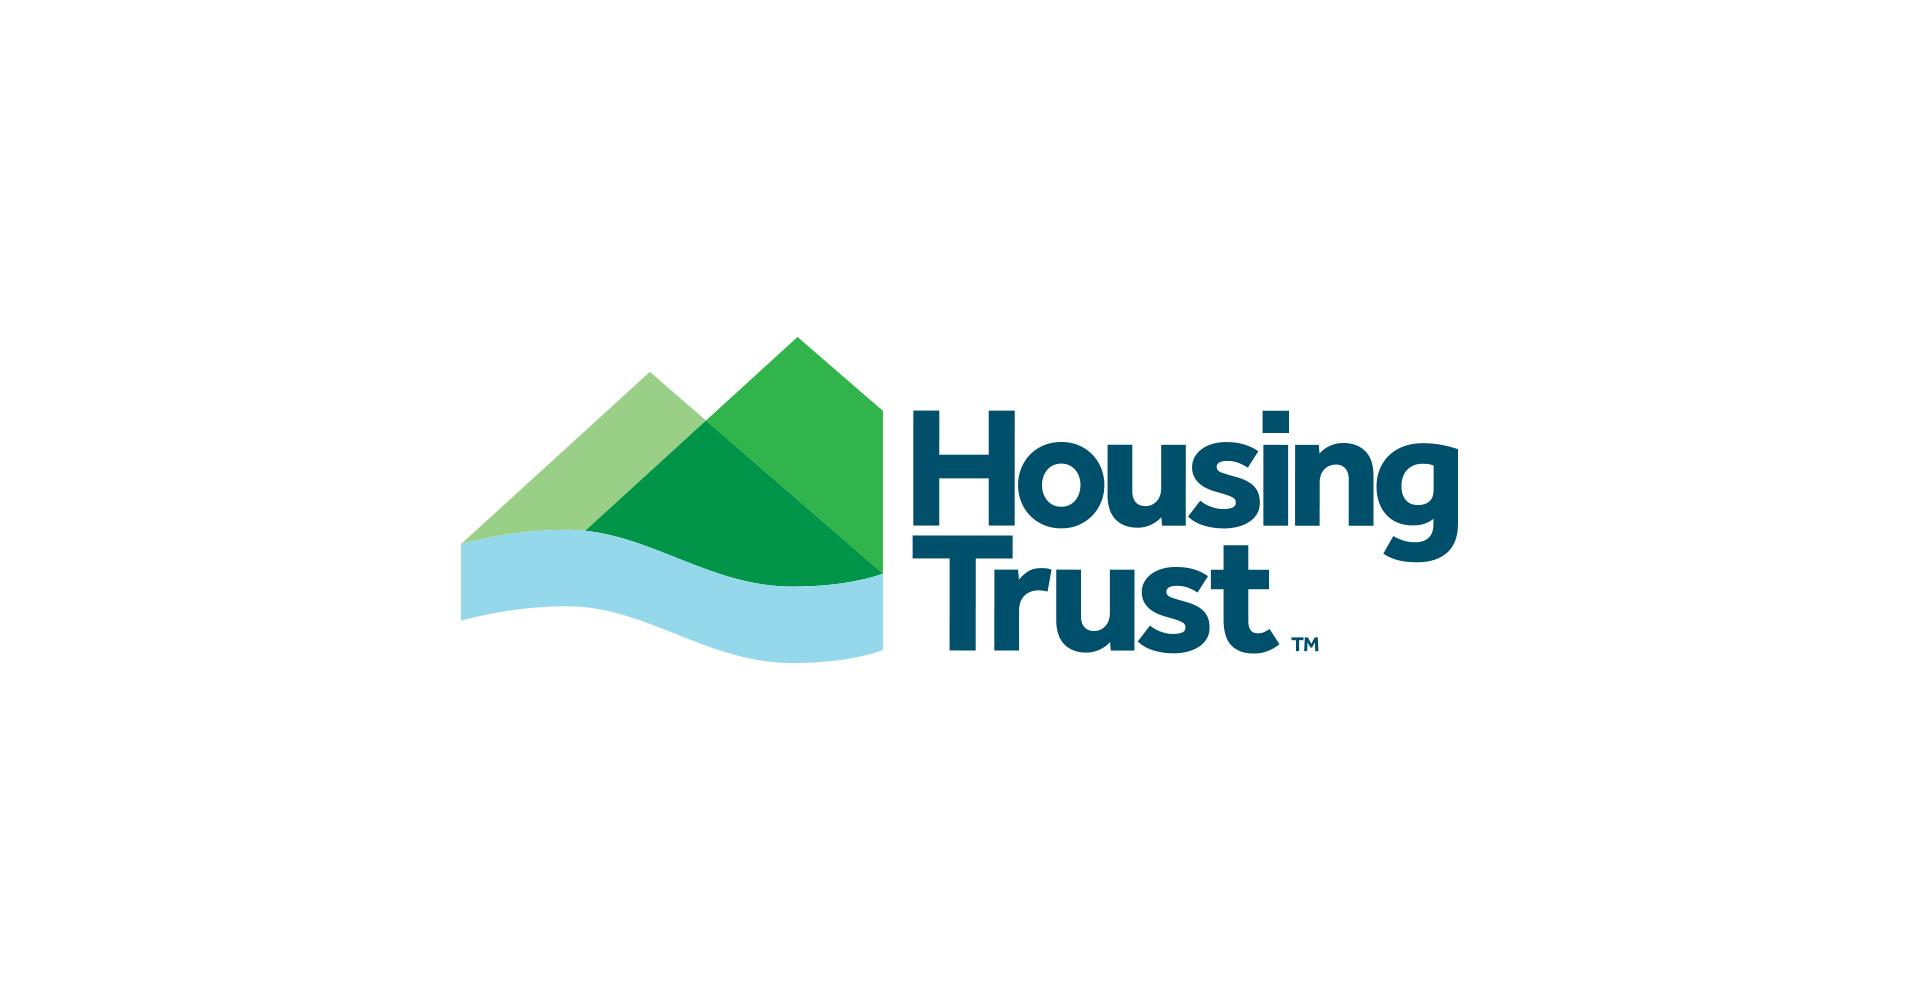 housing-trust-logo-united-yeah.jpg